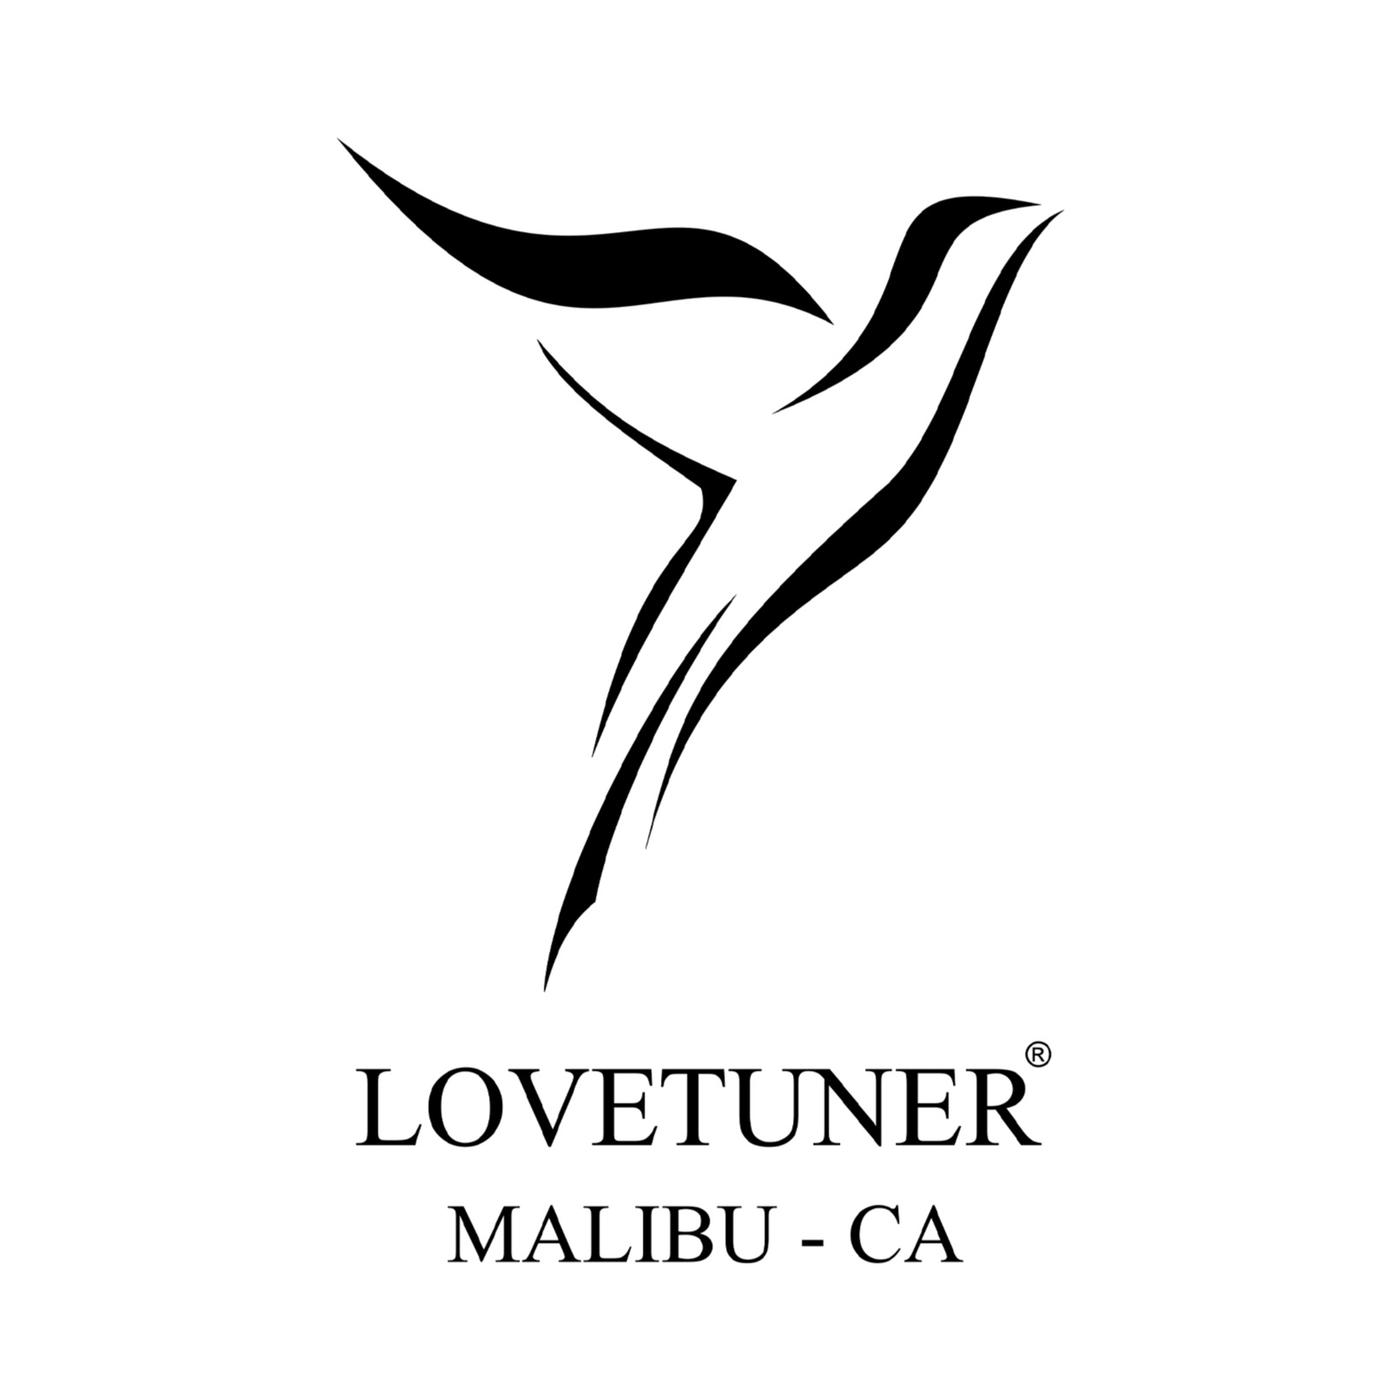 Lovetuner coupons